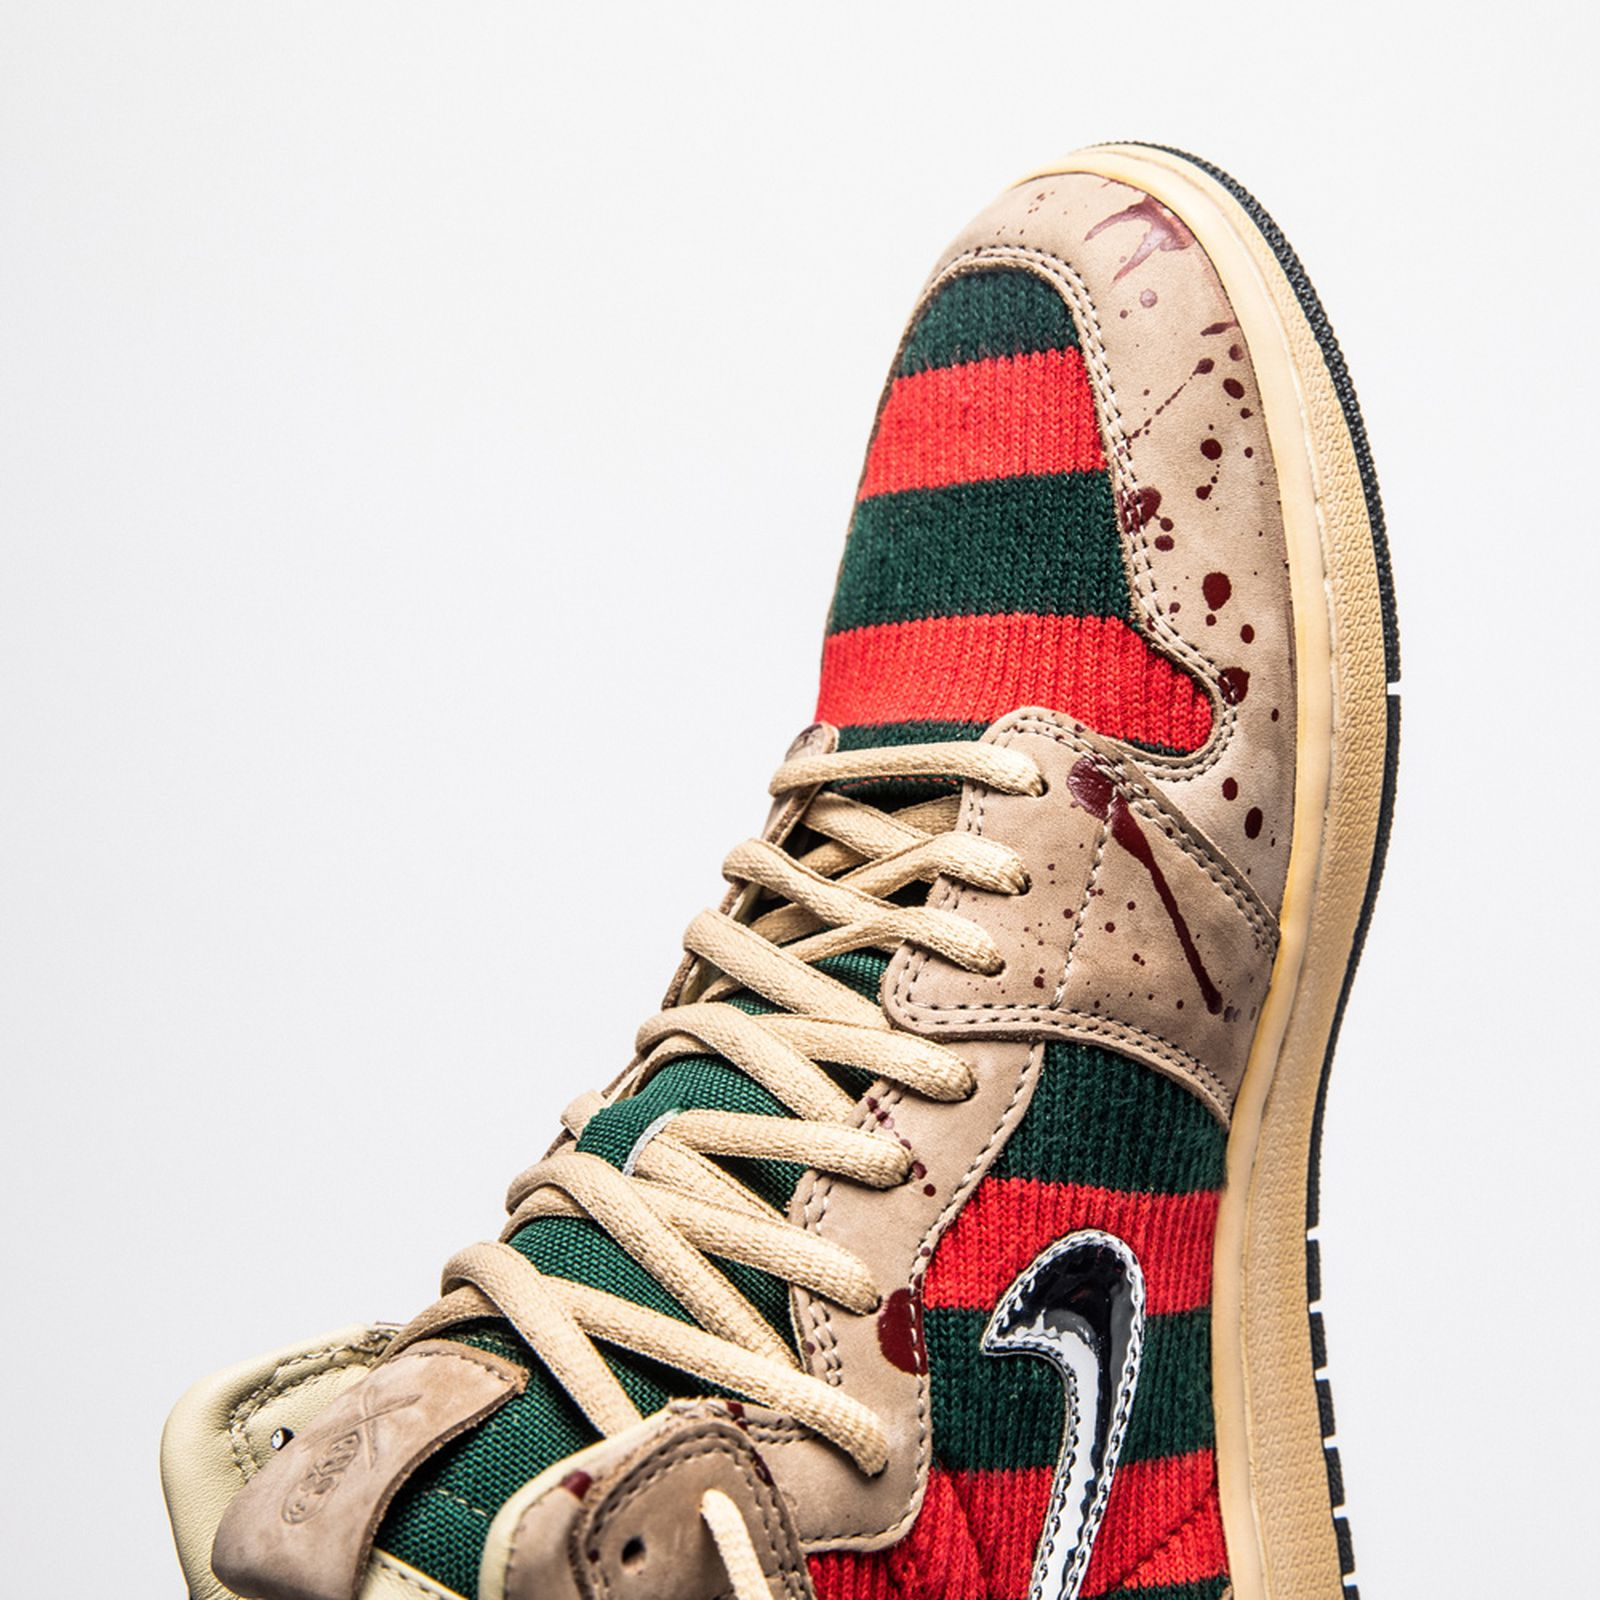 shoe-surgeon-nike-air-jordan-1-freddy-krueger-release-date-price-05